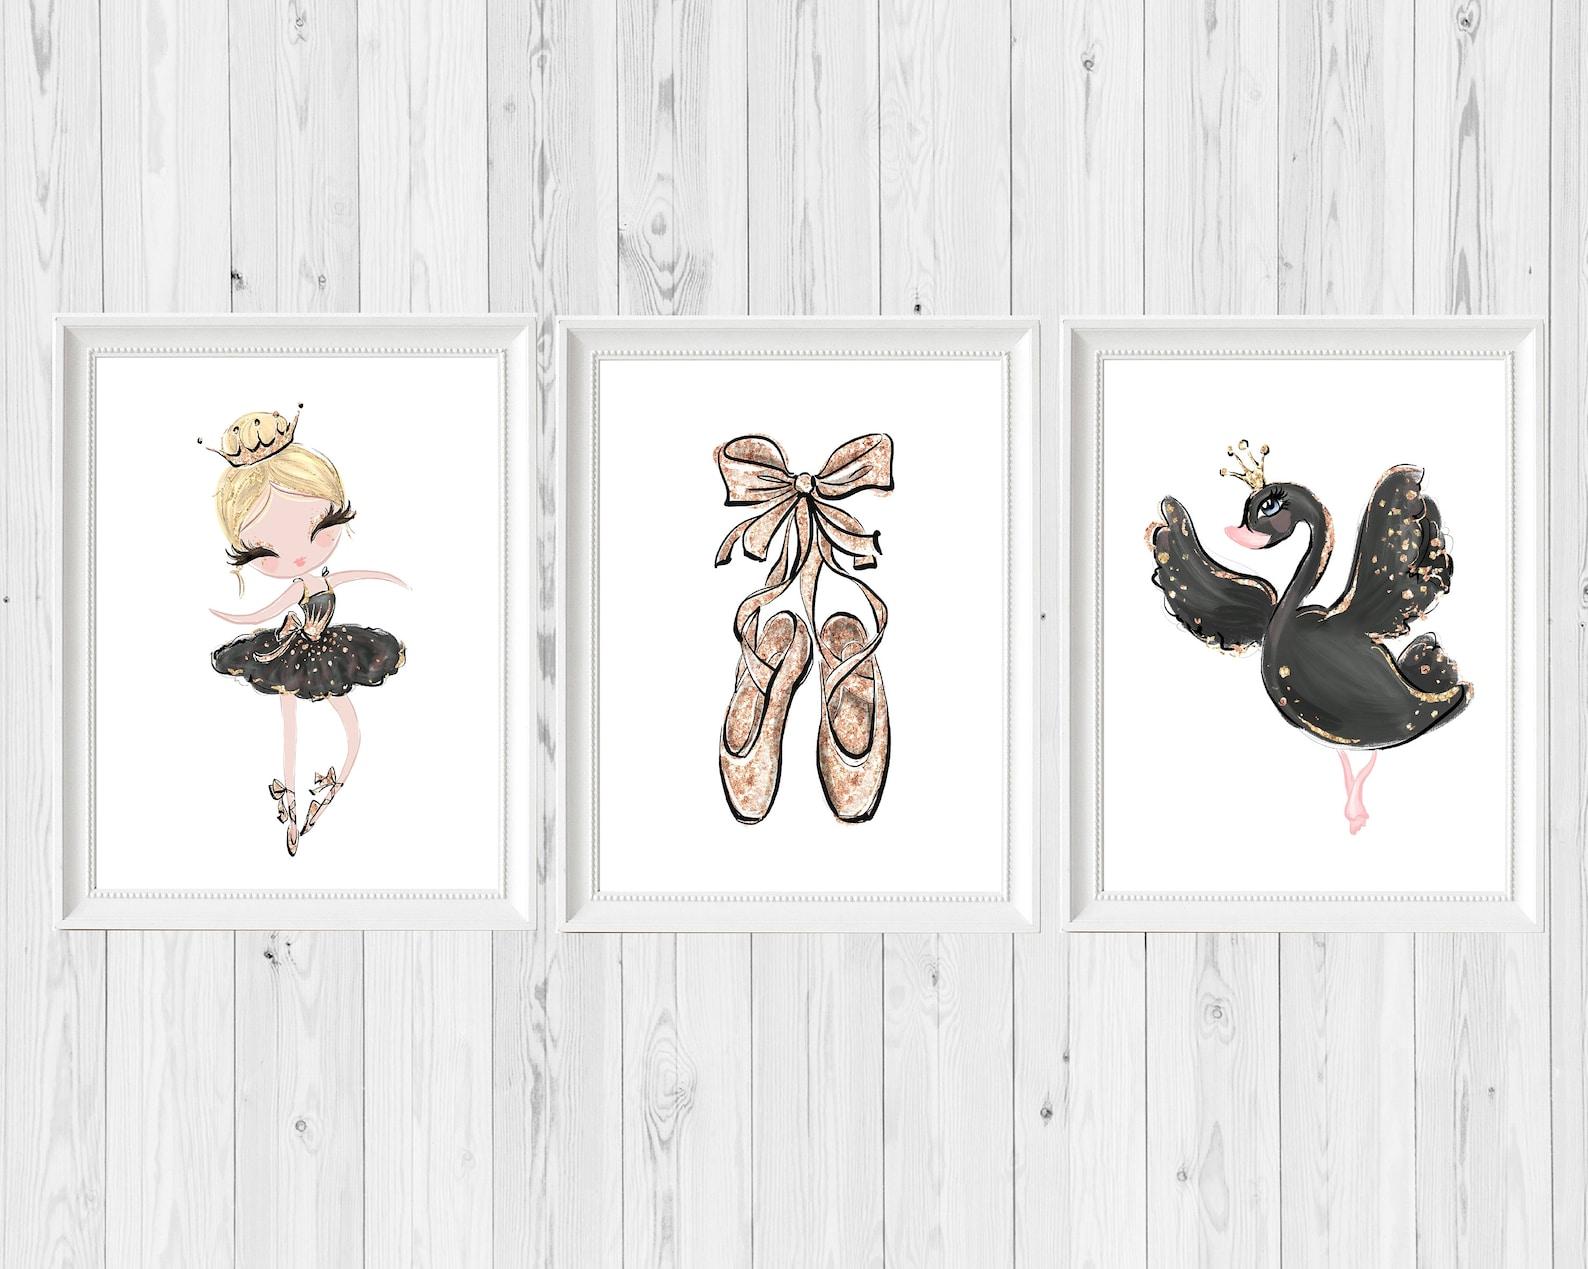 ballerina nursery art, black swan wall art print, ethereal gold sparkle, black ballet shoes, baby girl, whimsical bohemian, prin